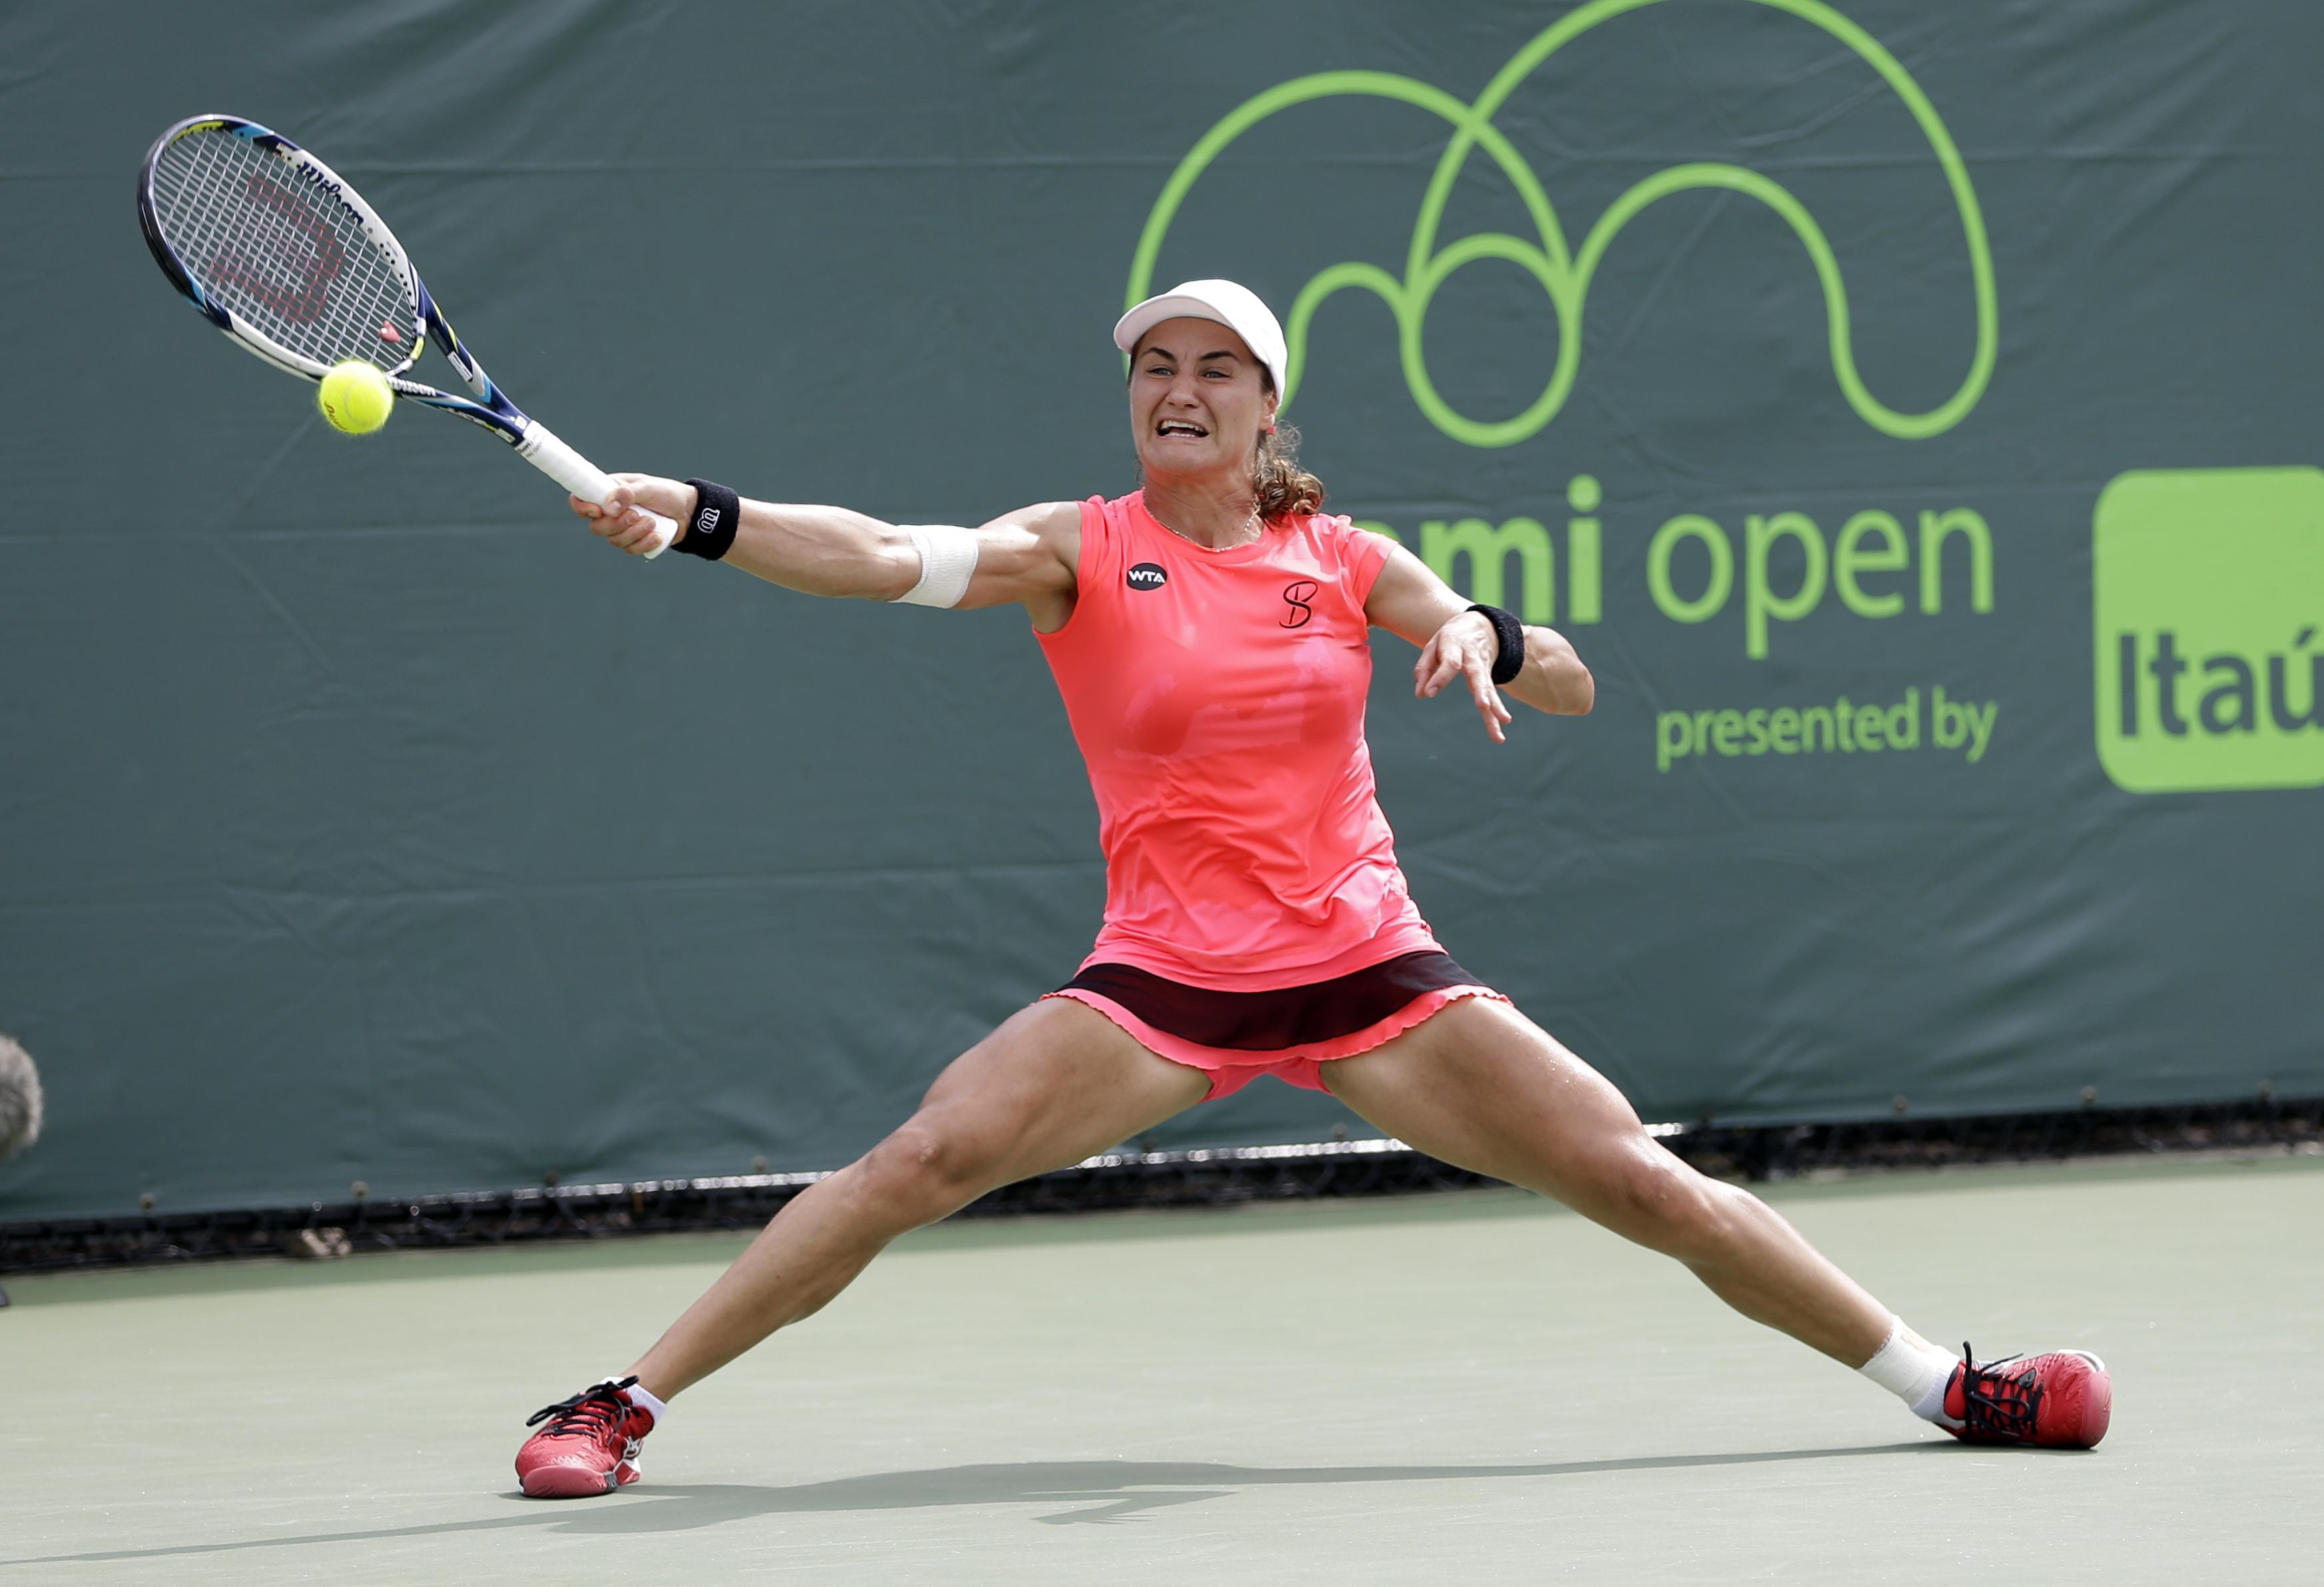 Monica Niculescu, of Romania, returns to Johanna Konta, of Britain, during the Miami Open tennis tournament in Key Biscayne, Fla., Monday, March 28, 2016. (AP Photo/Alan Diaz)